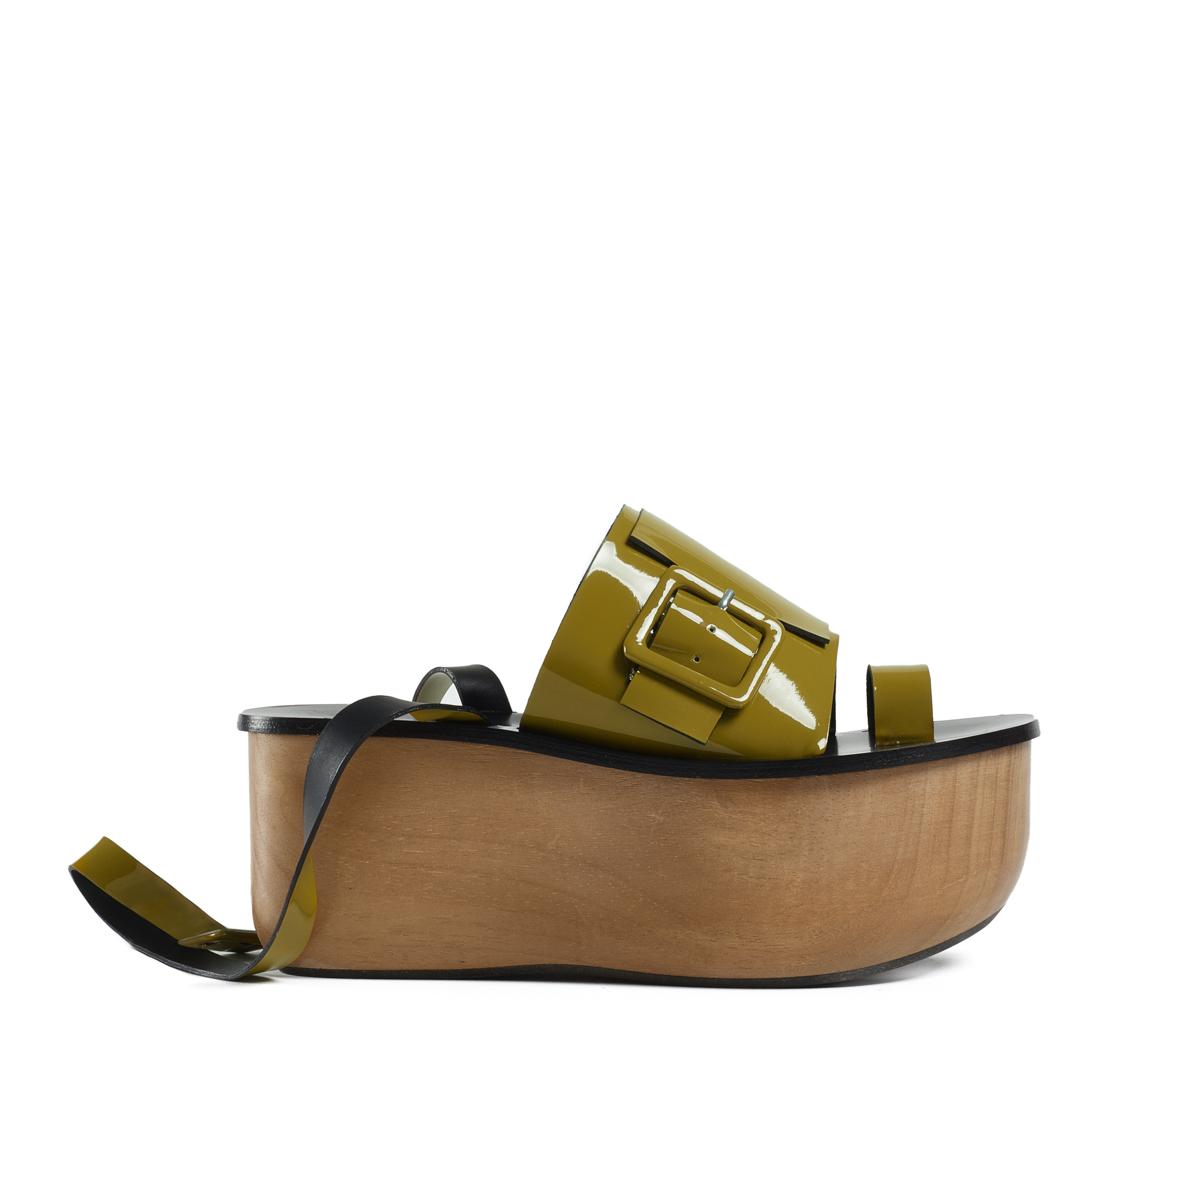 041_alaintondowski_springsummer2017_shoes_3021-contr